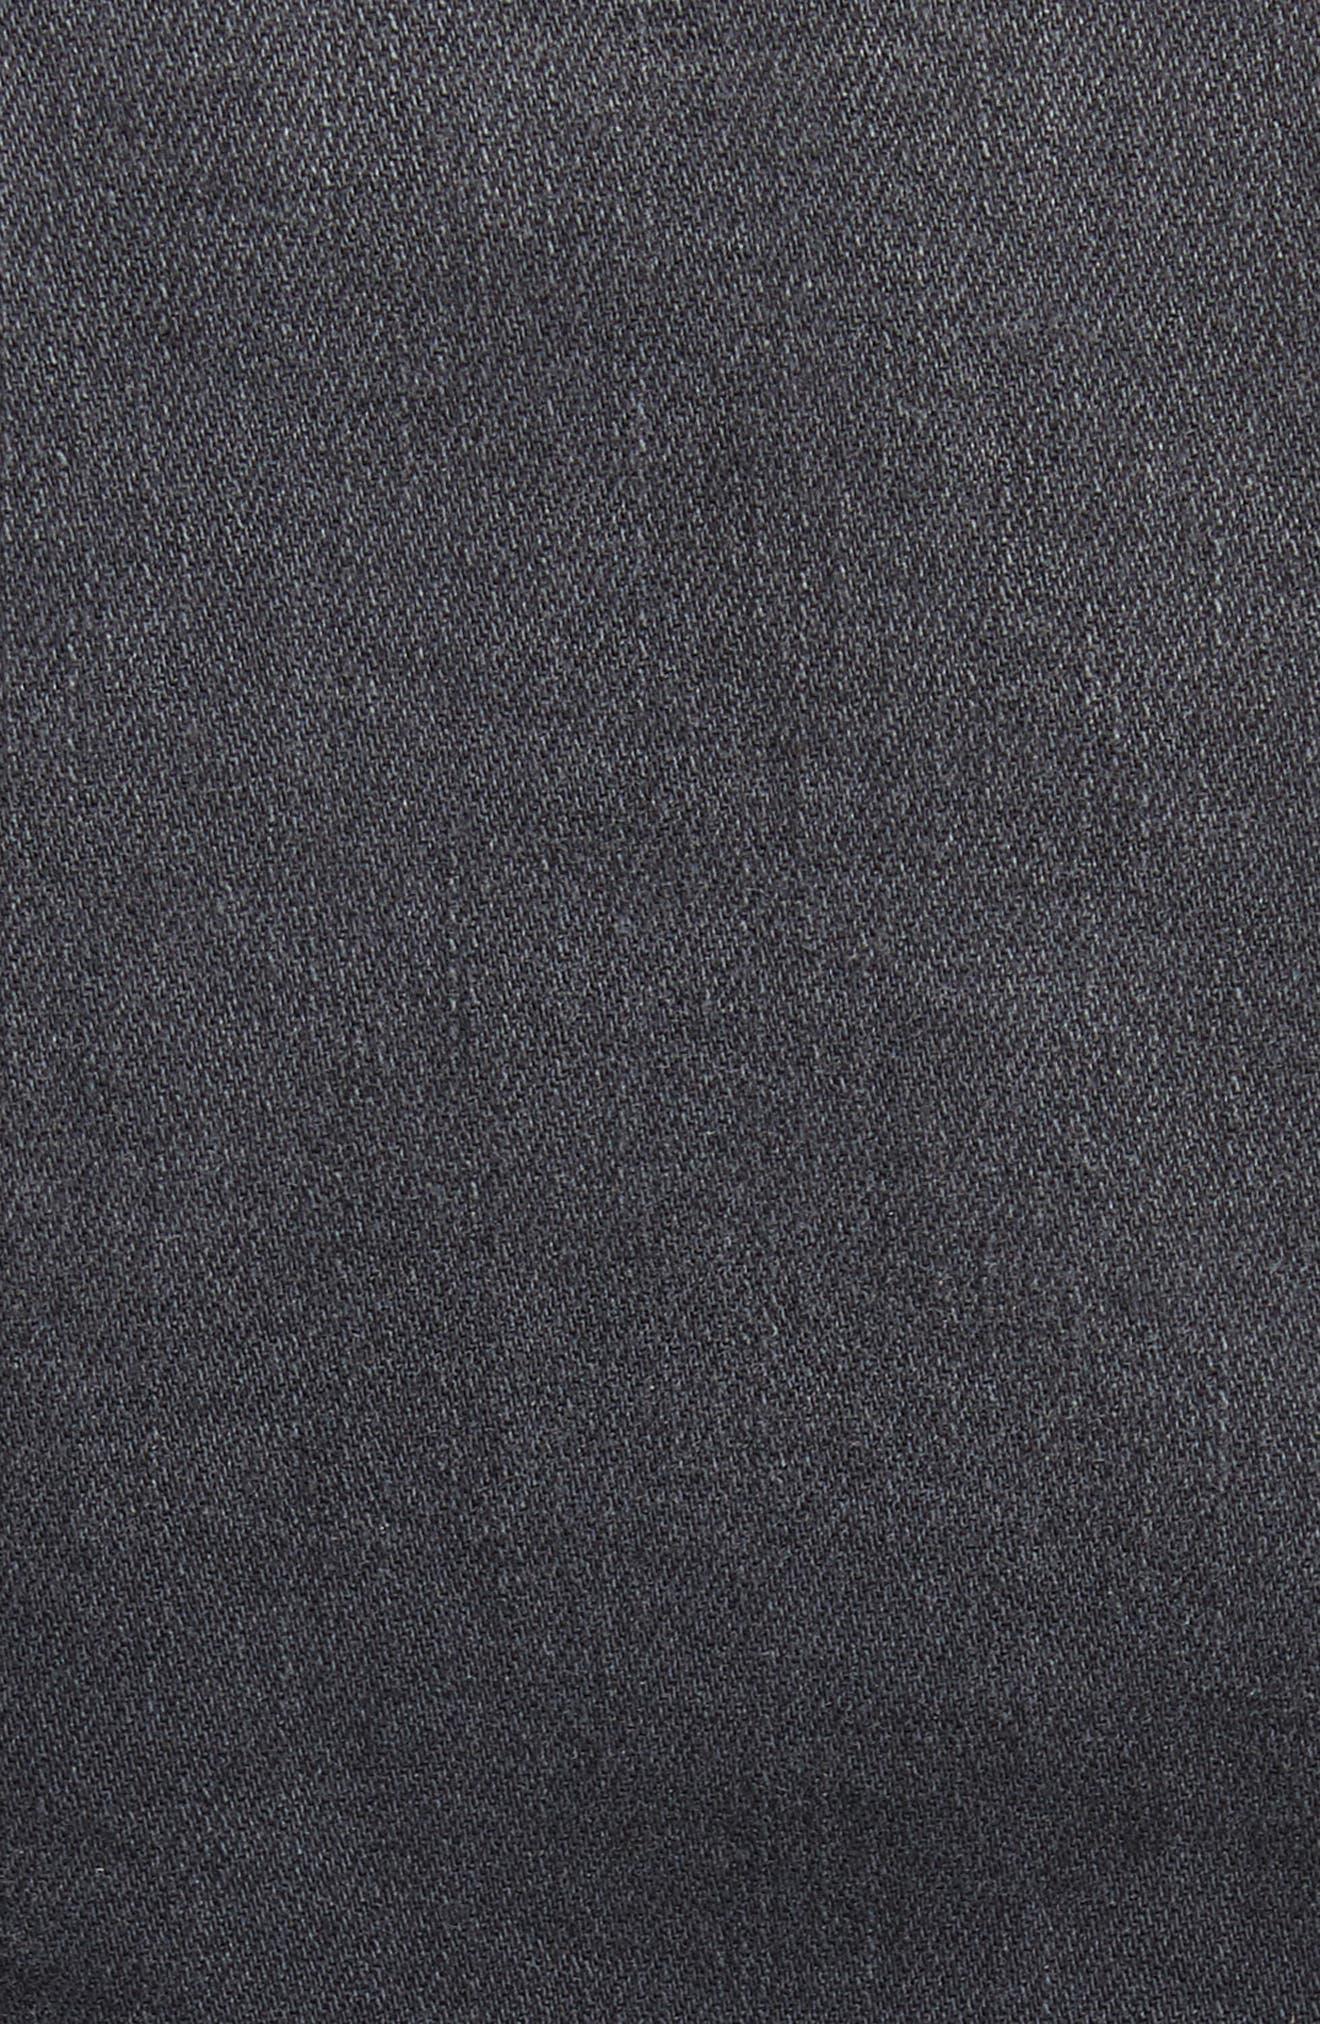 Zuma Lace Up Crop Denim Jacket,                             Alternate thumbnail 6, color,                             006